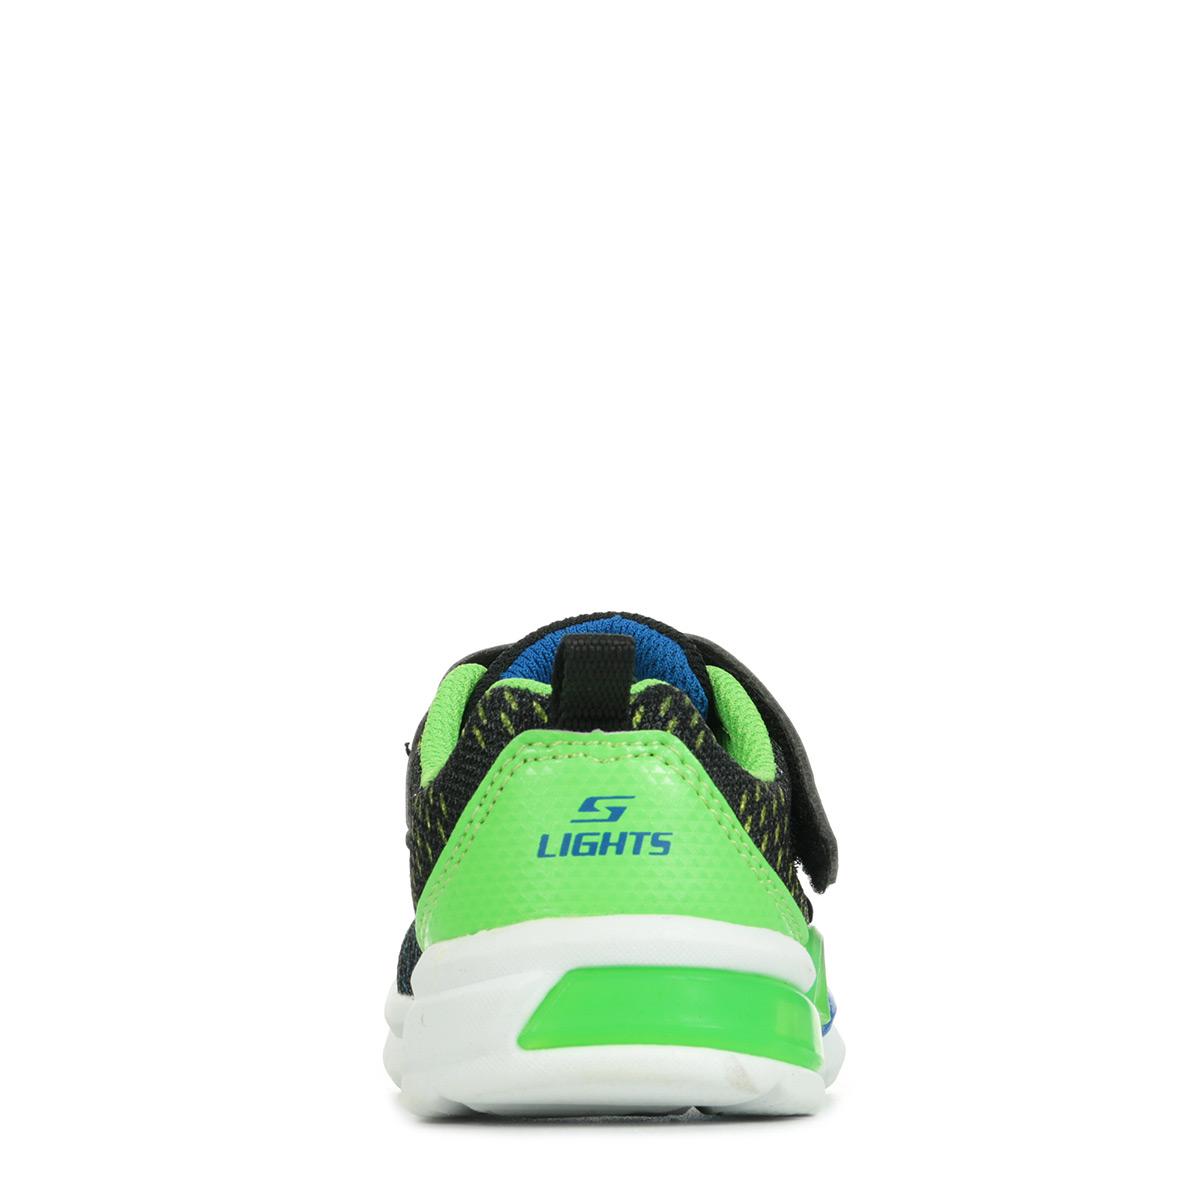 Baskets Skechers Erupters II S Lights Lava Arc cXlv3xhh